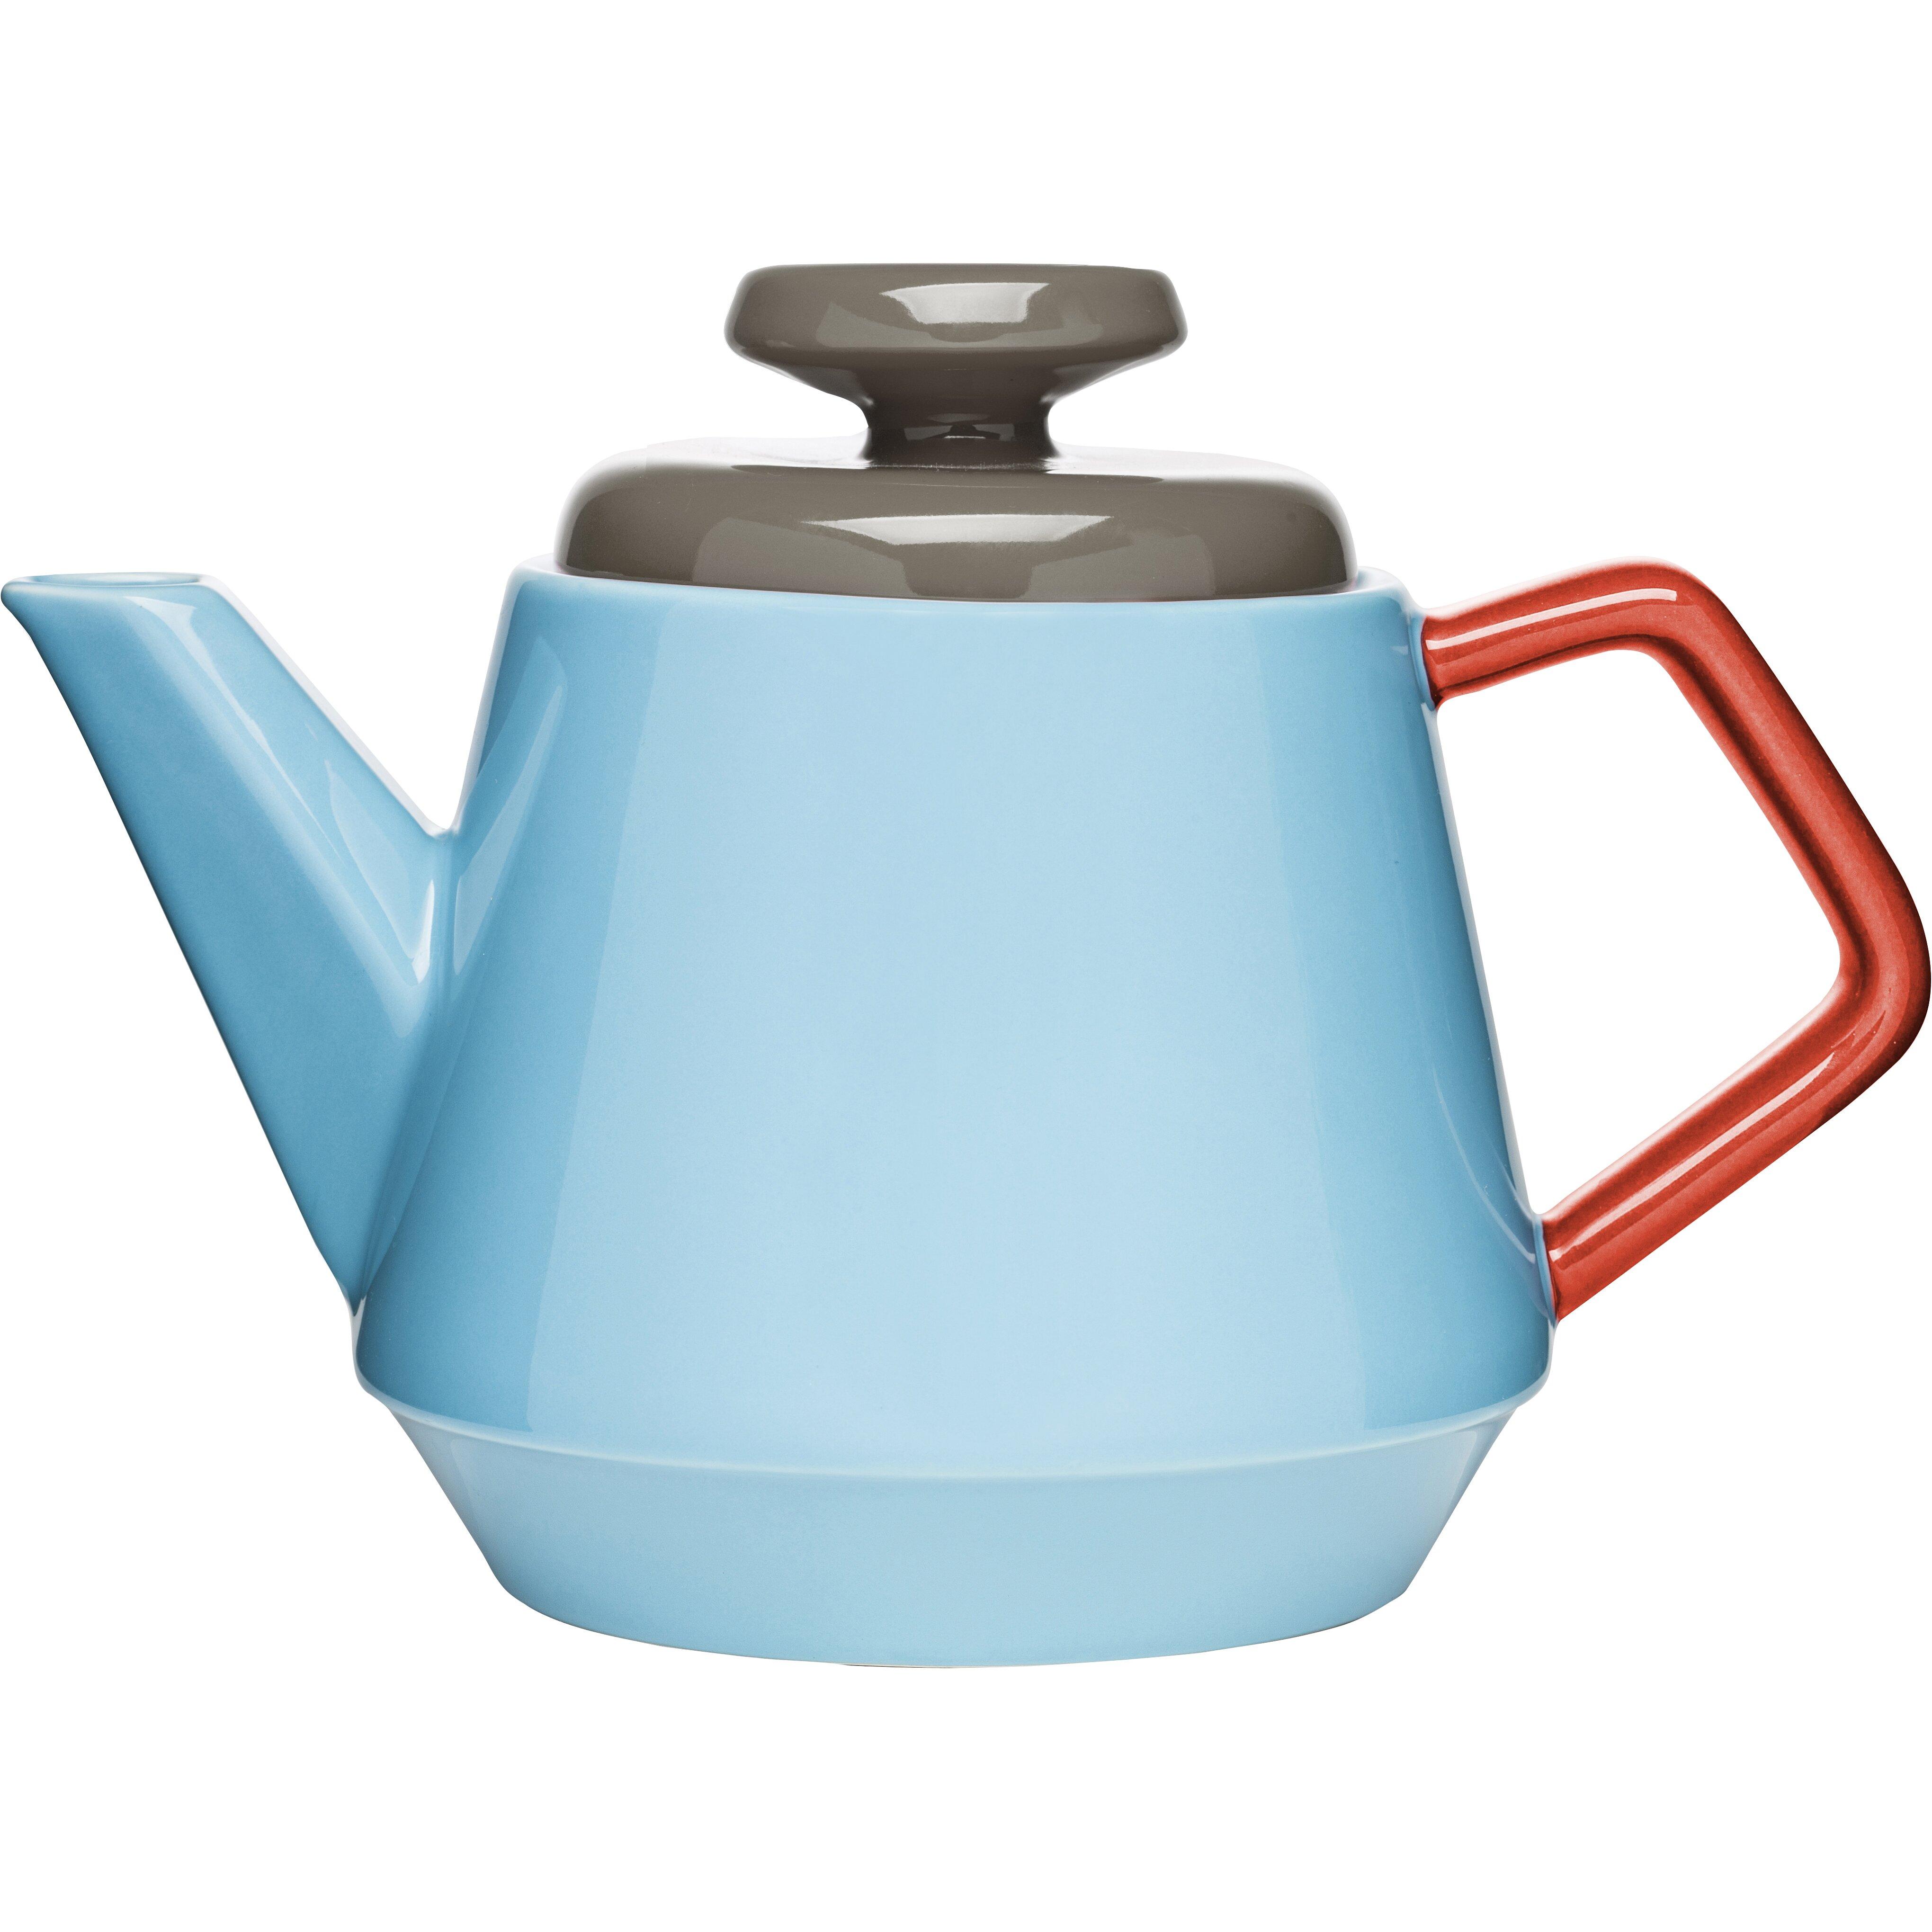 sagaform kettle teapot reviews wayfair. Black Bedroom Furniture Sets. Home Design Ideas